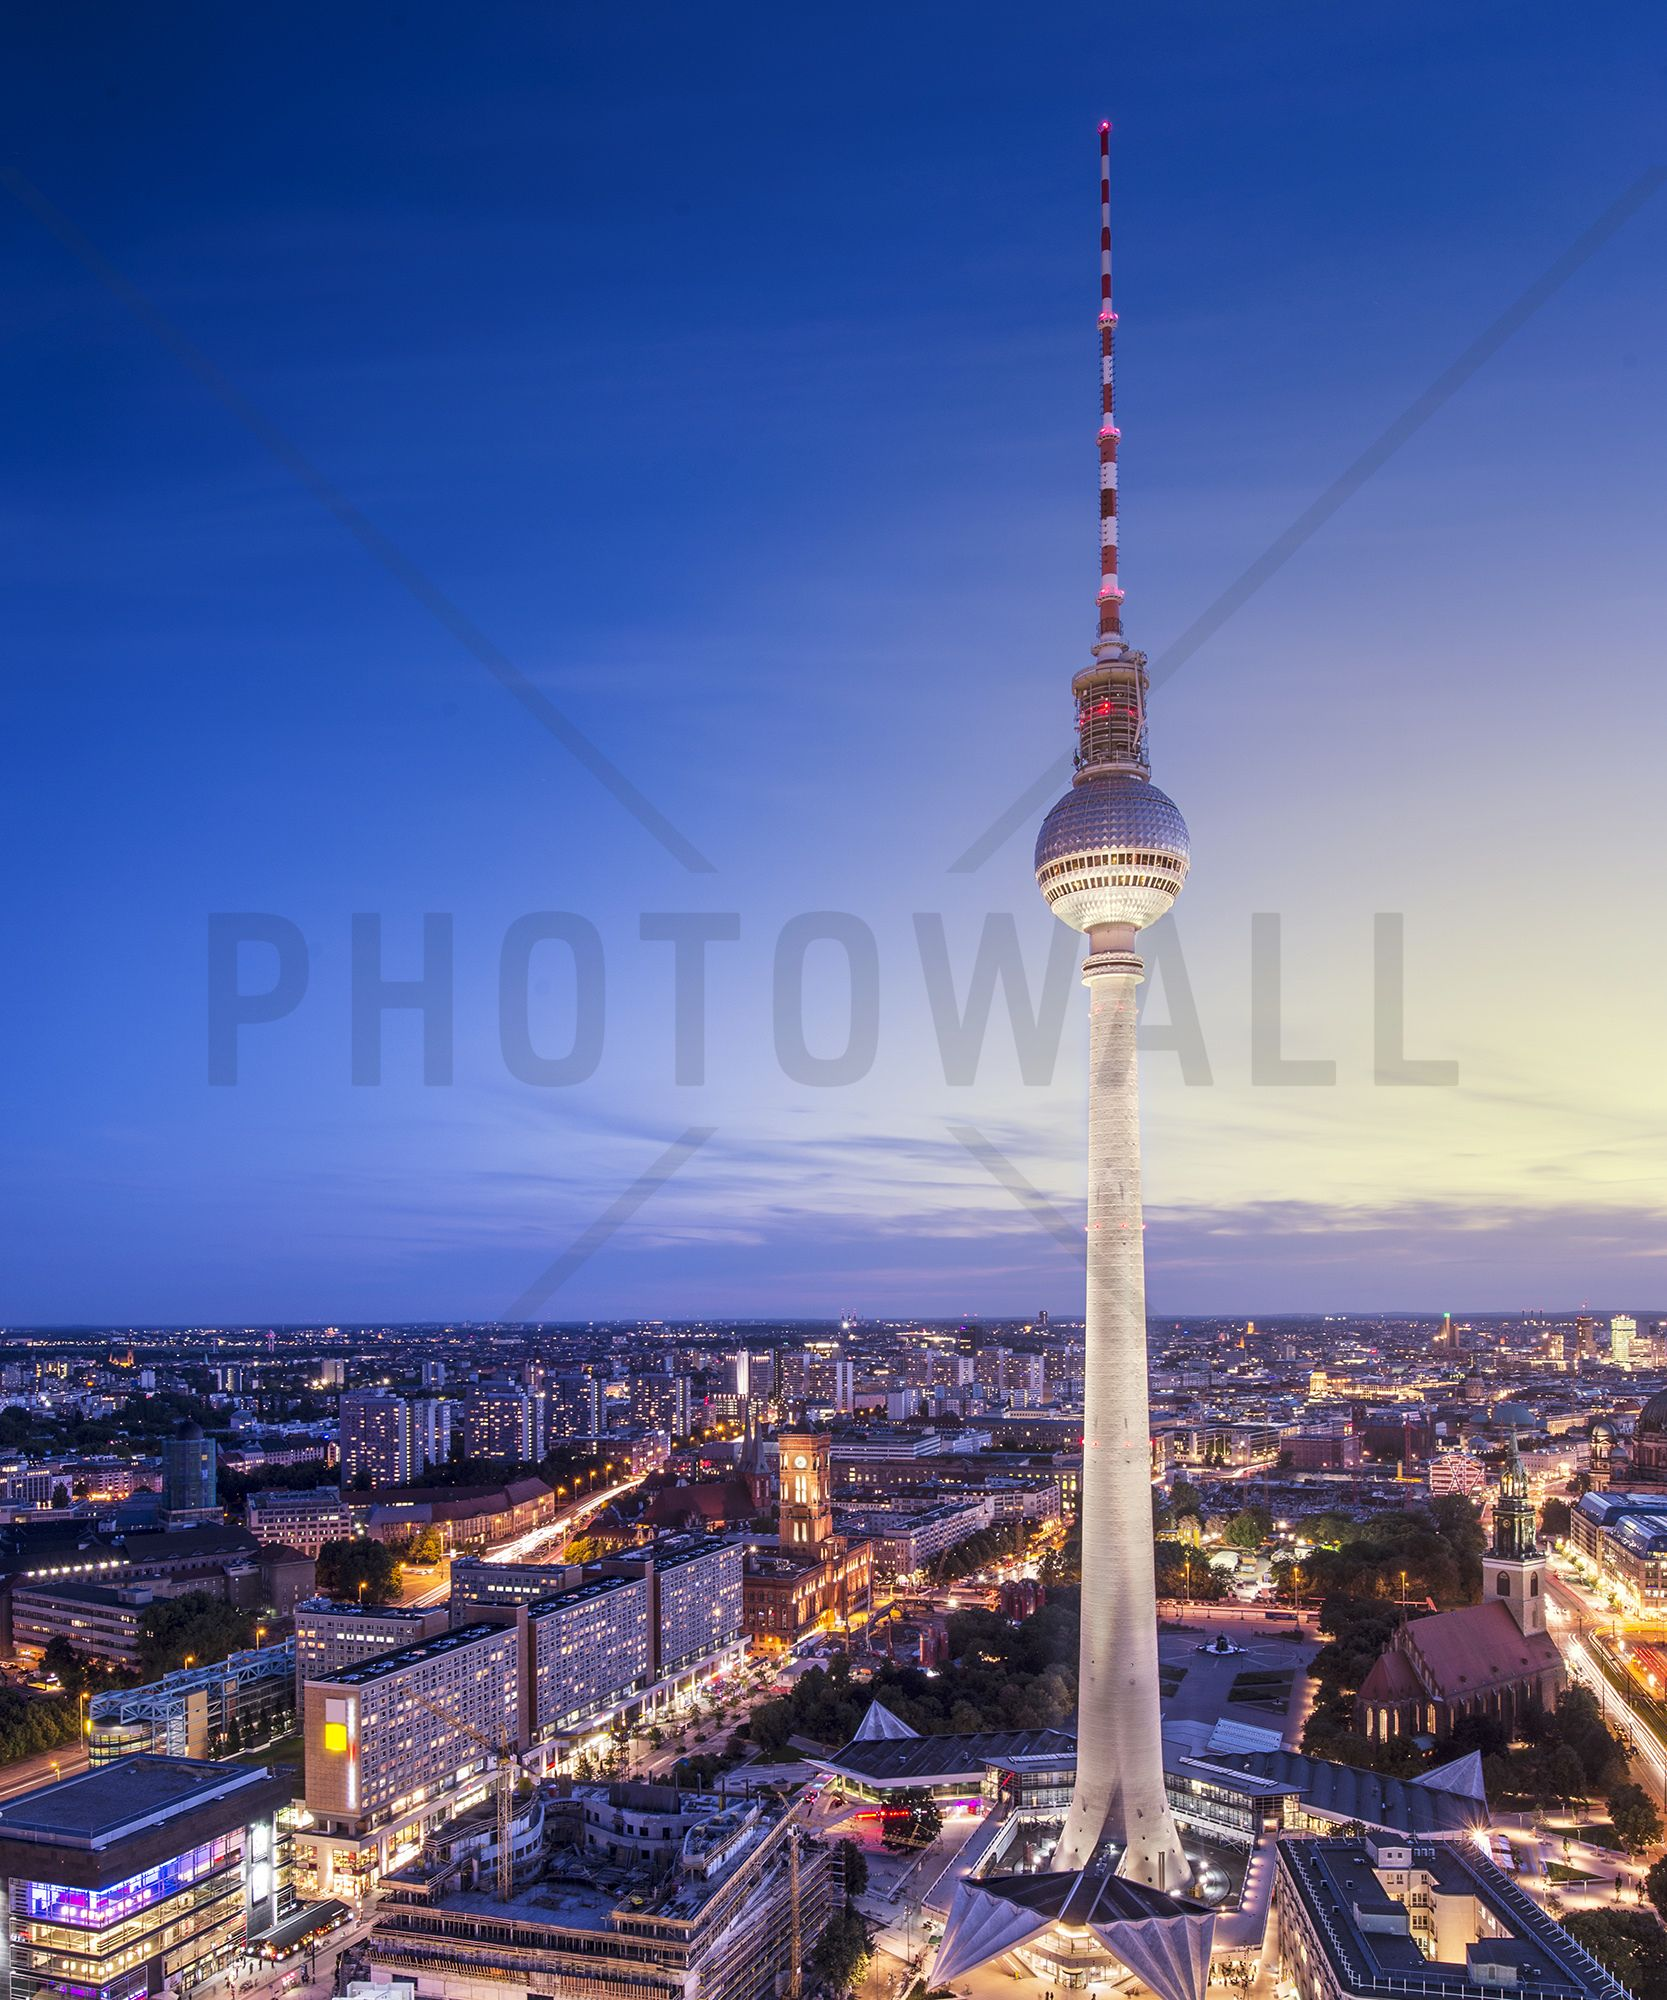 Berlin Germany View Of Tv Tower Fototapeter Tapeter Photowall Tarn Fototapet